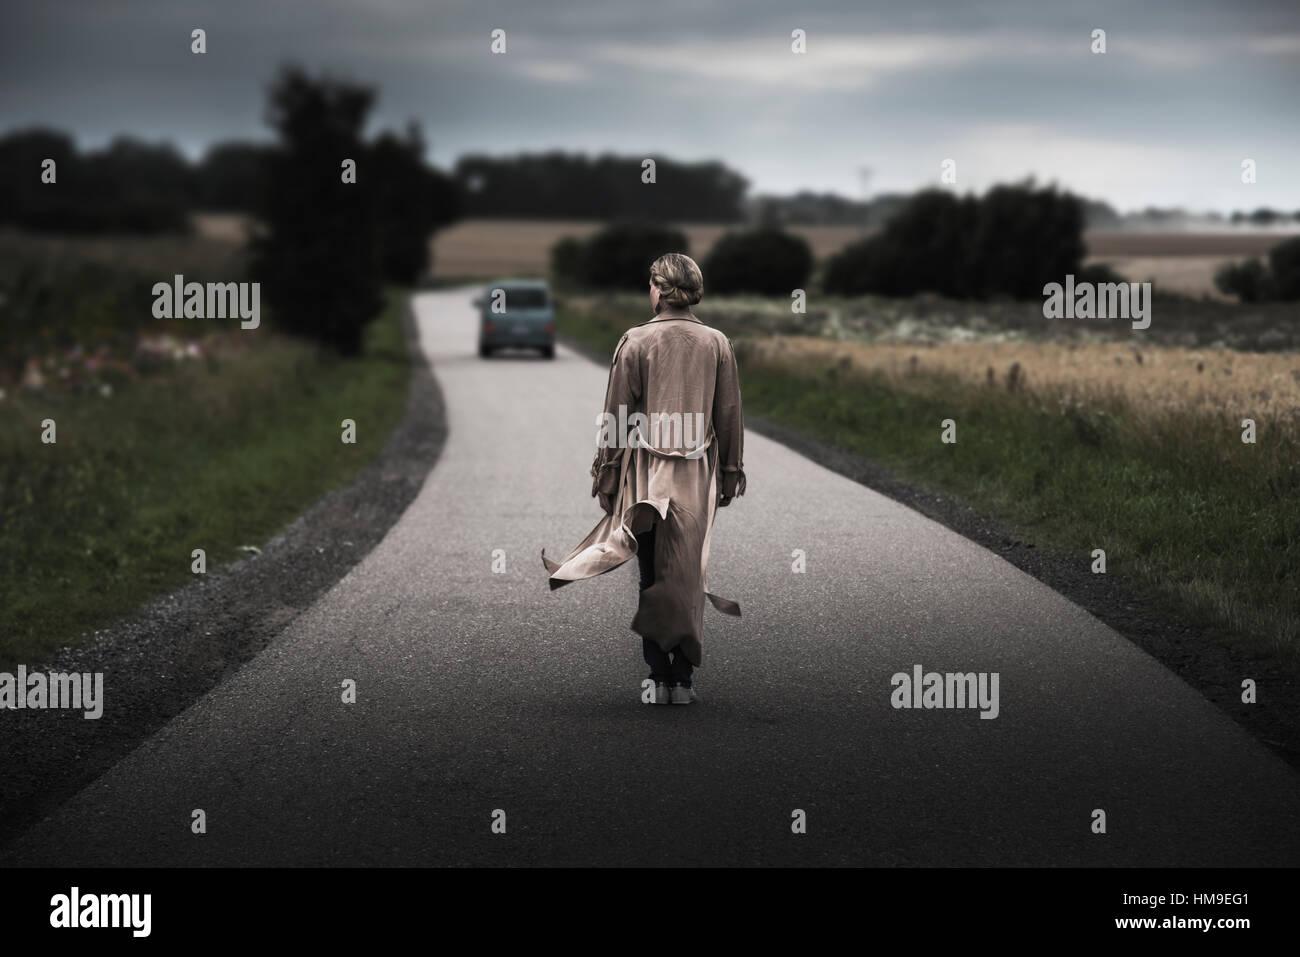 backside of woman with long overcoat walking on narrow road - Stock Image